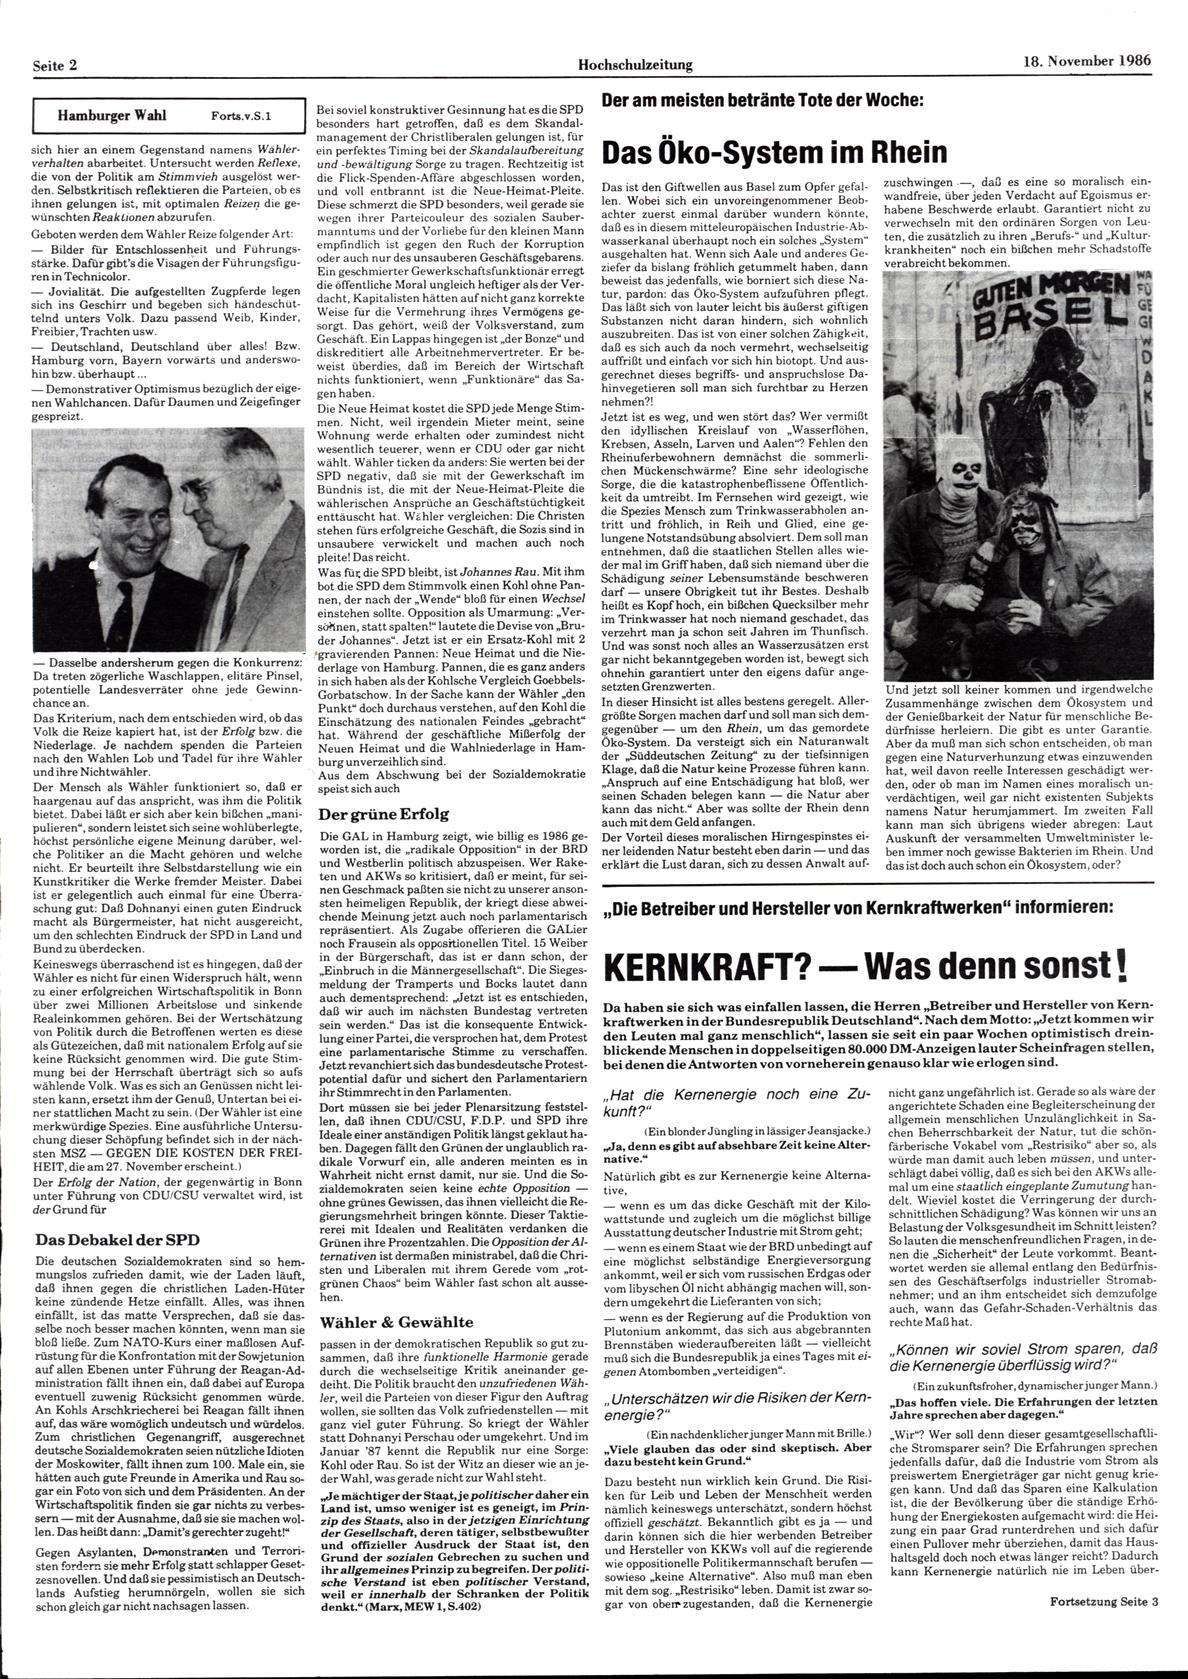 Bochum_BHZ_19861118_139_002